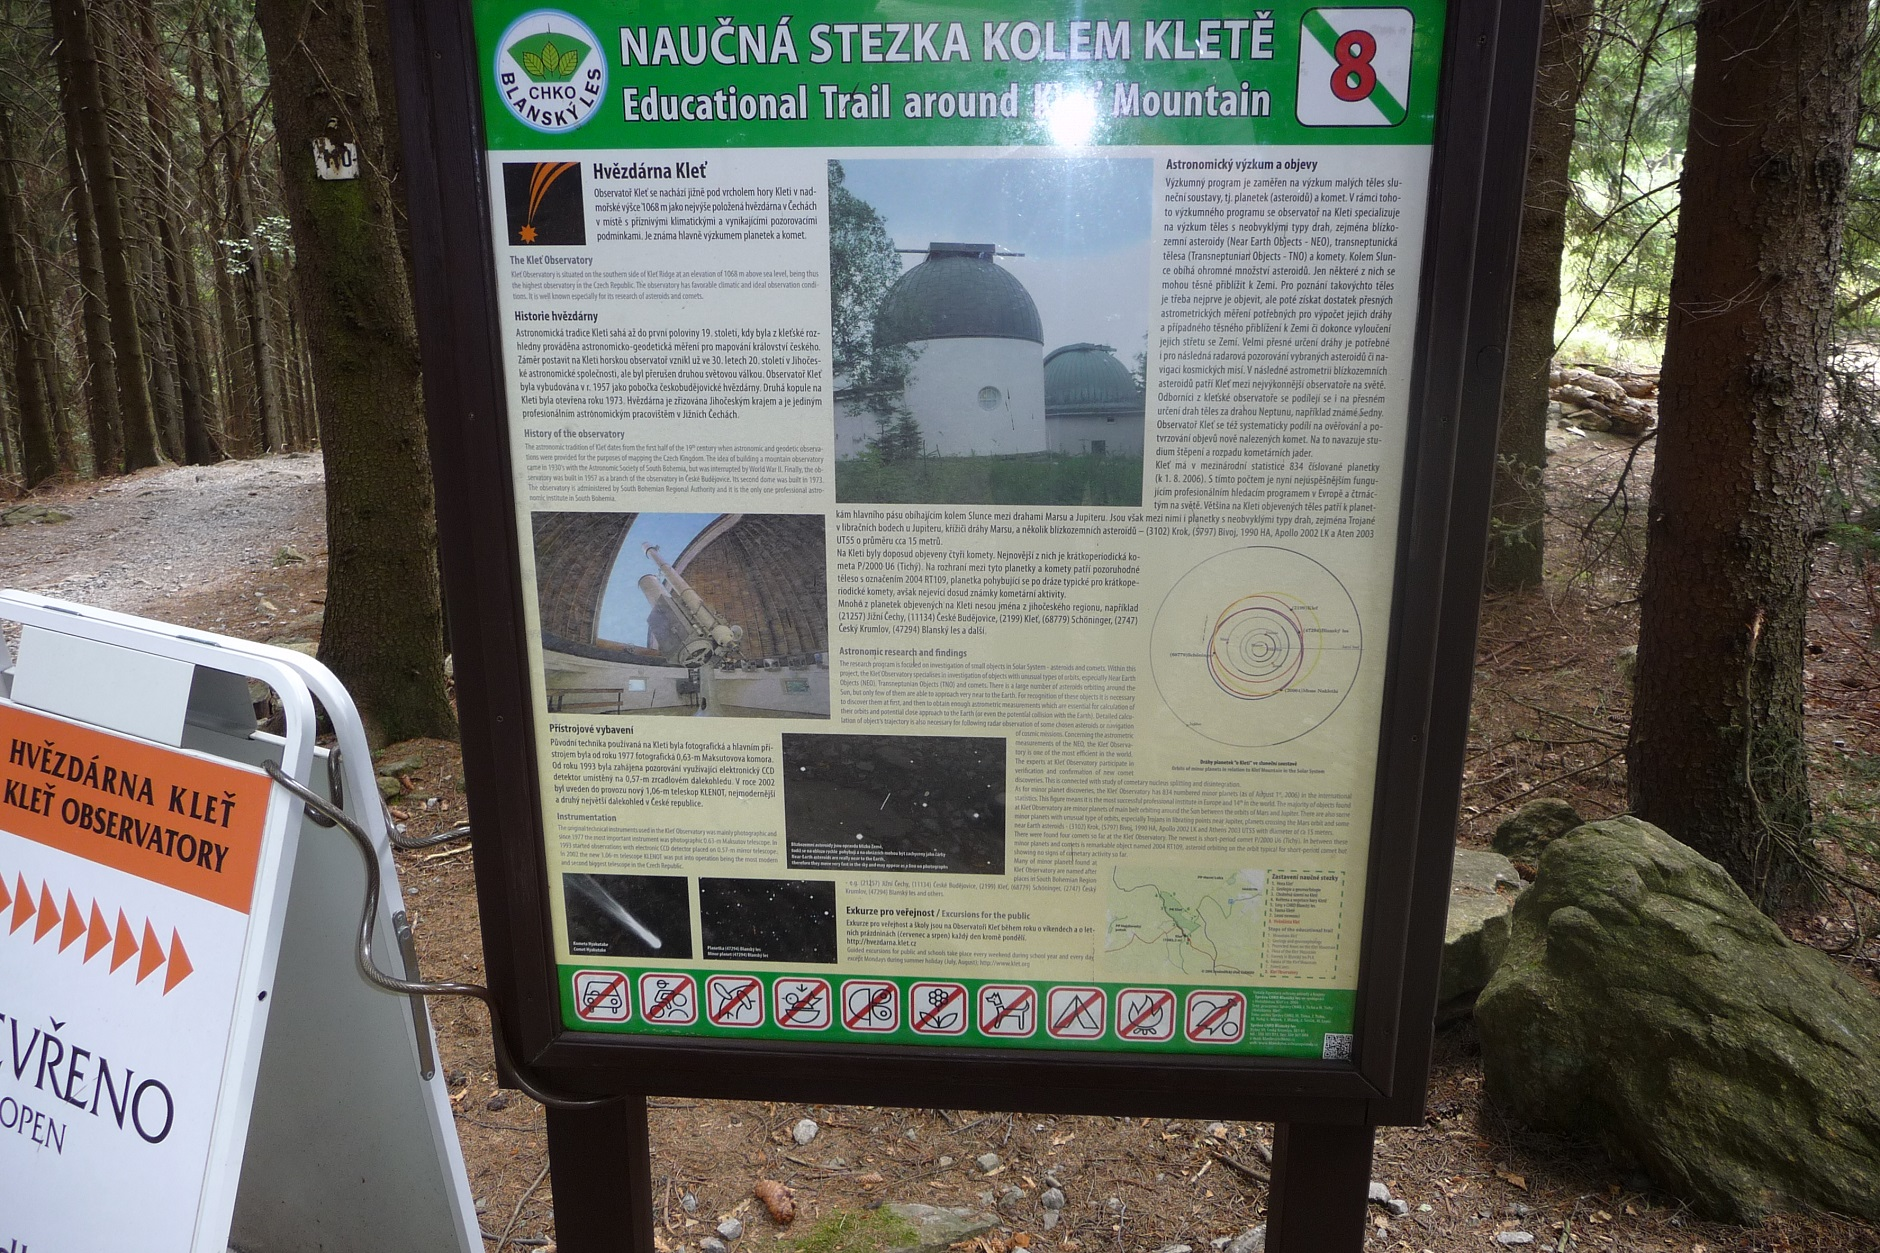 https://www.kempy-chaty.cz/sites/default/files/turistika/naucna_stezka_kolem_klete.jpg